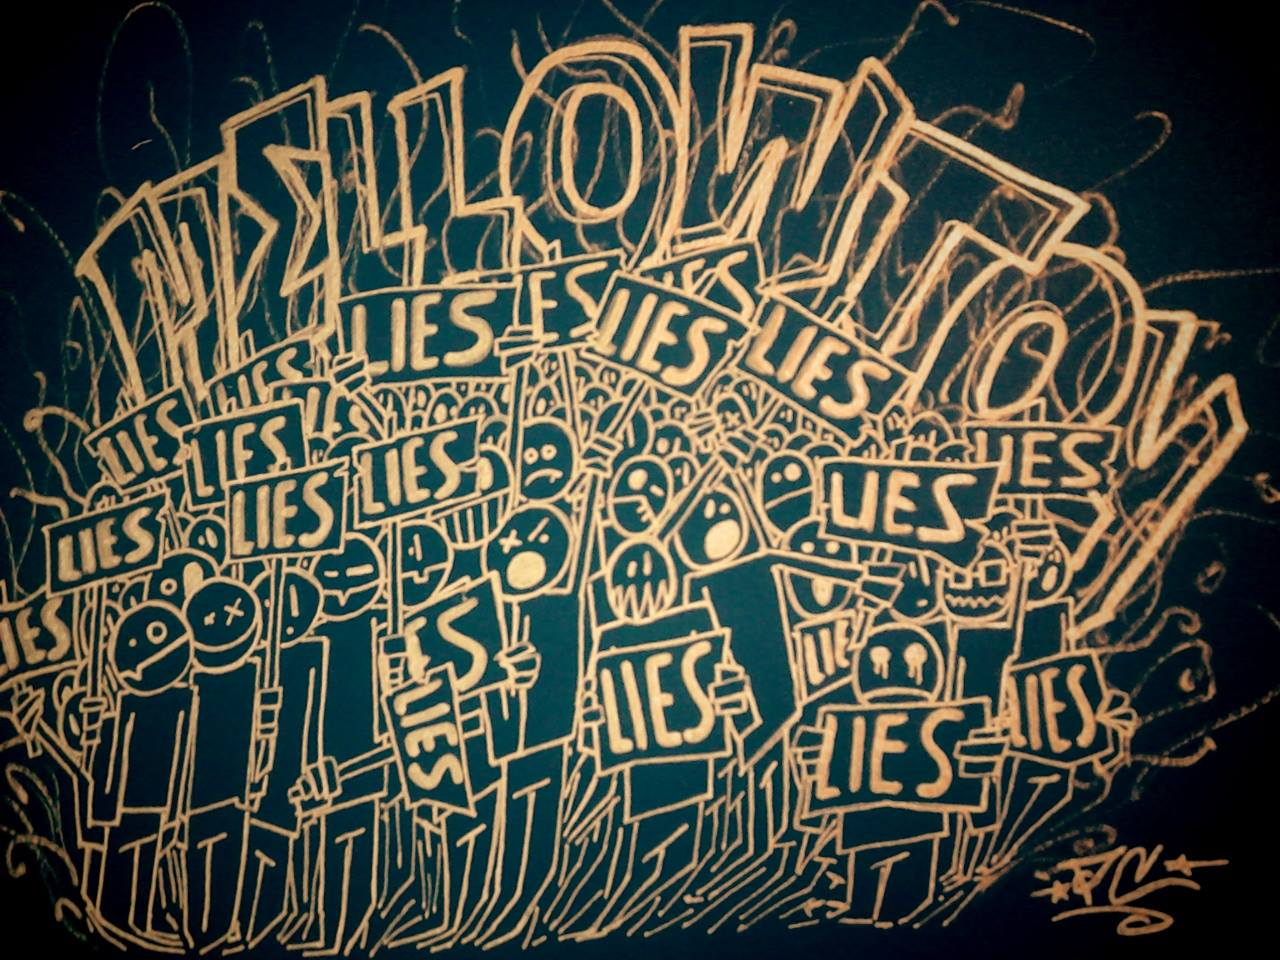 Mellowtoy